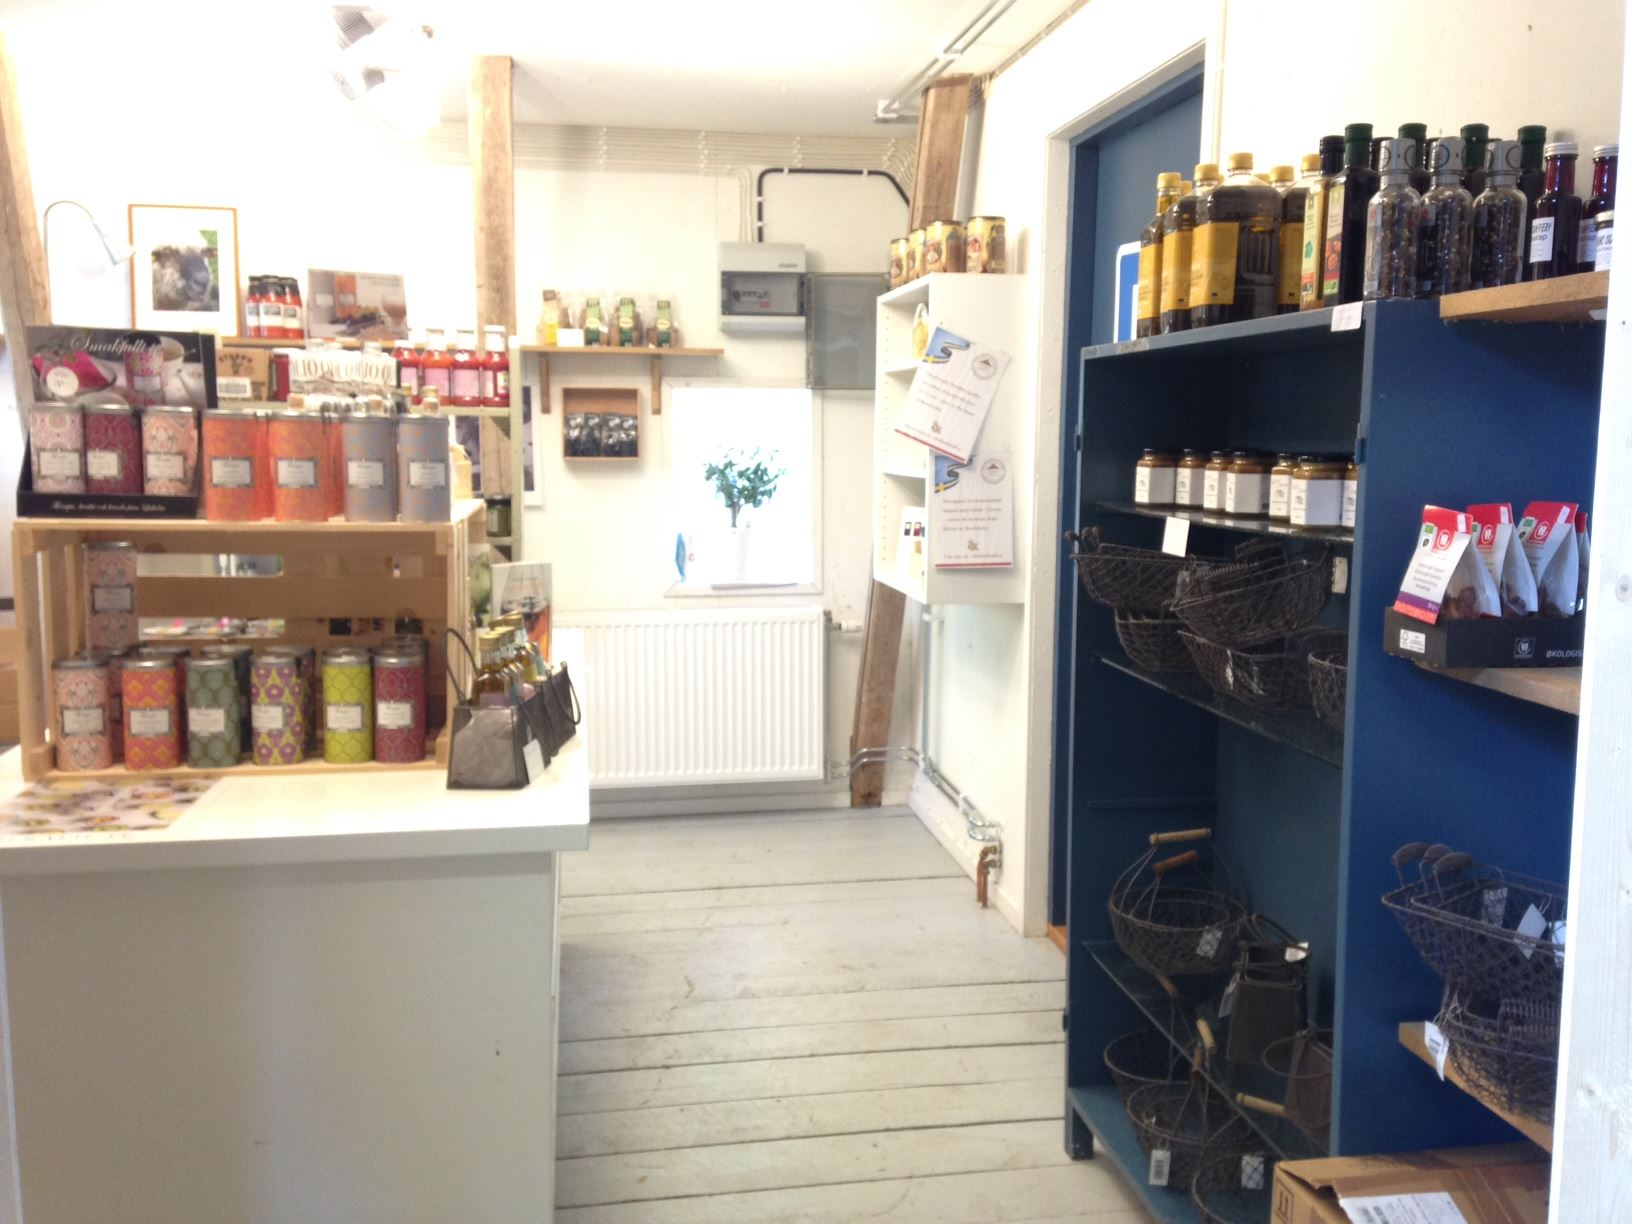 Farm shop in Topperyd